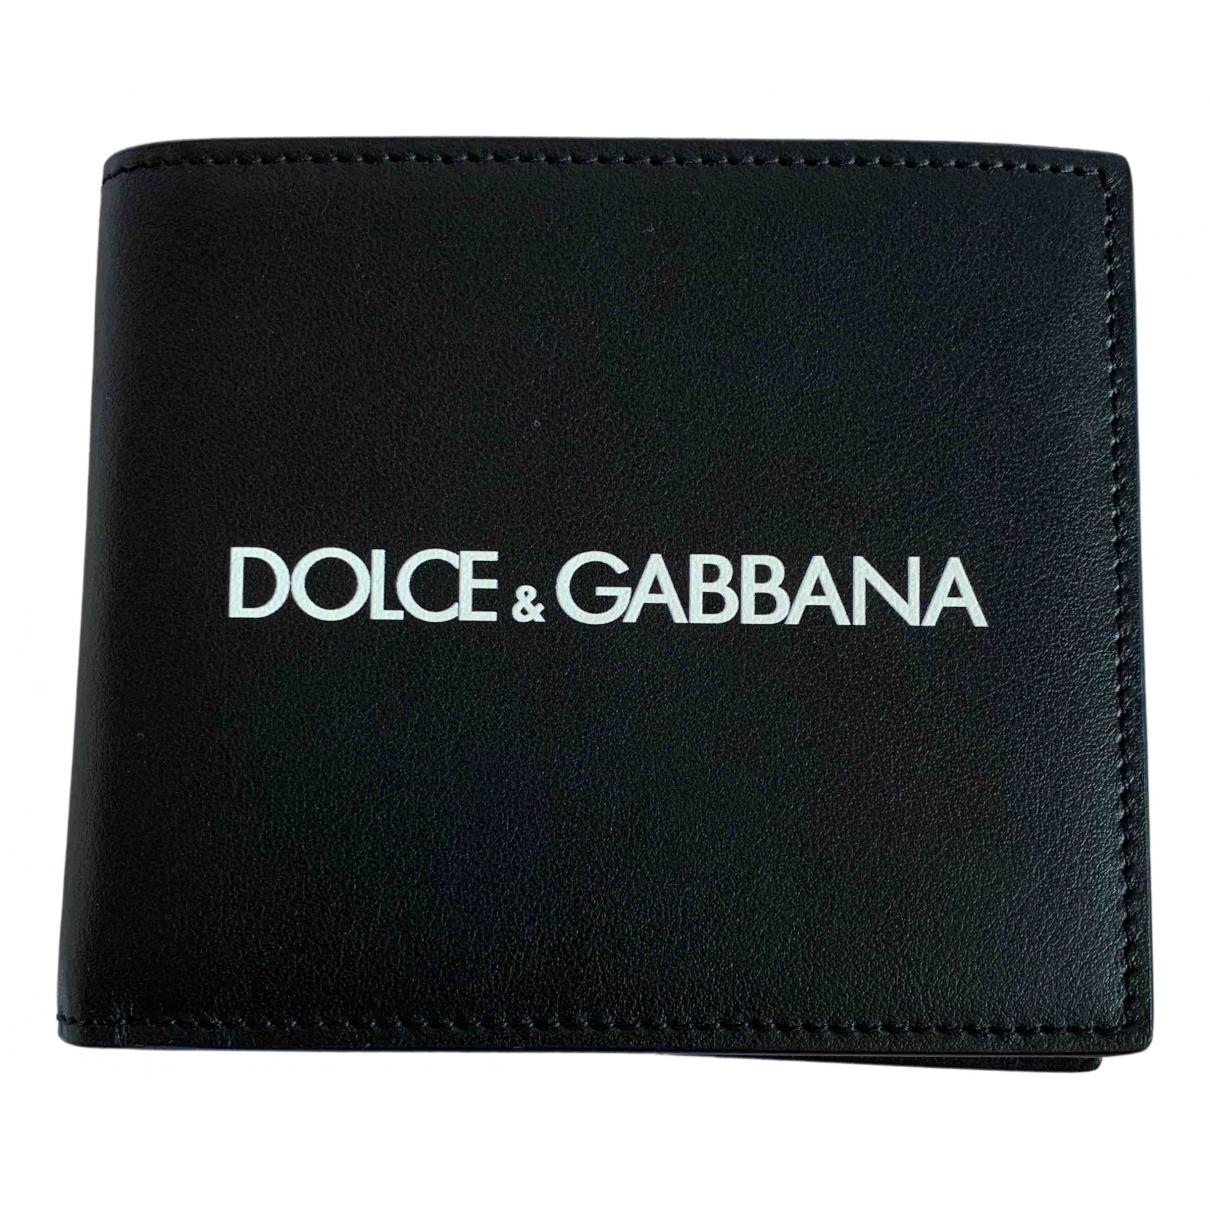 Dolce & Gabbana N Black Leather Small bag, wallet & cases for Men N